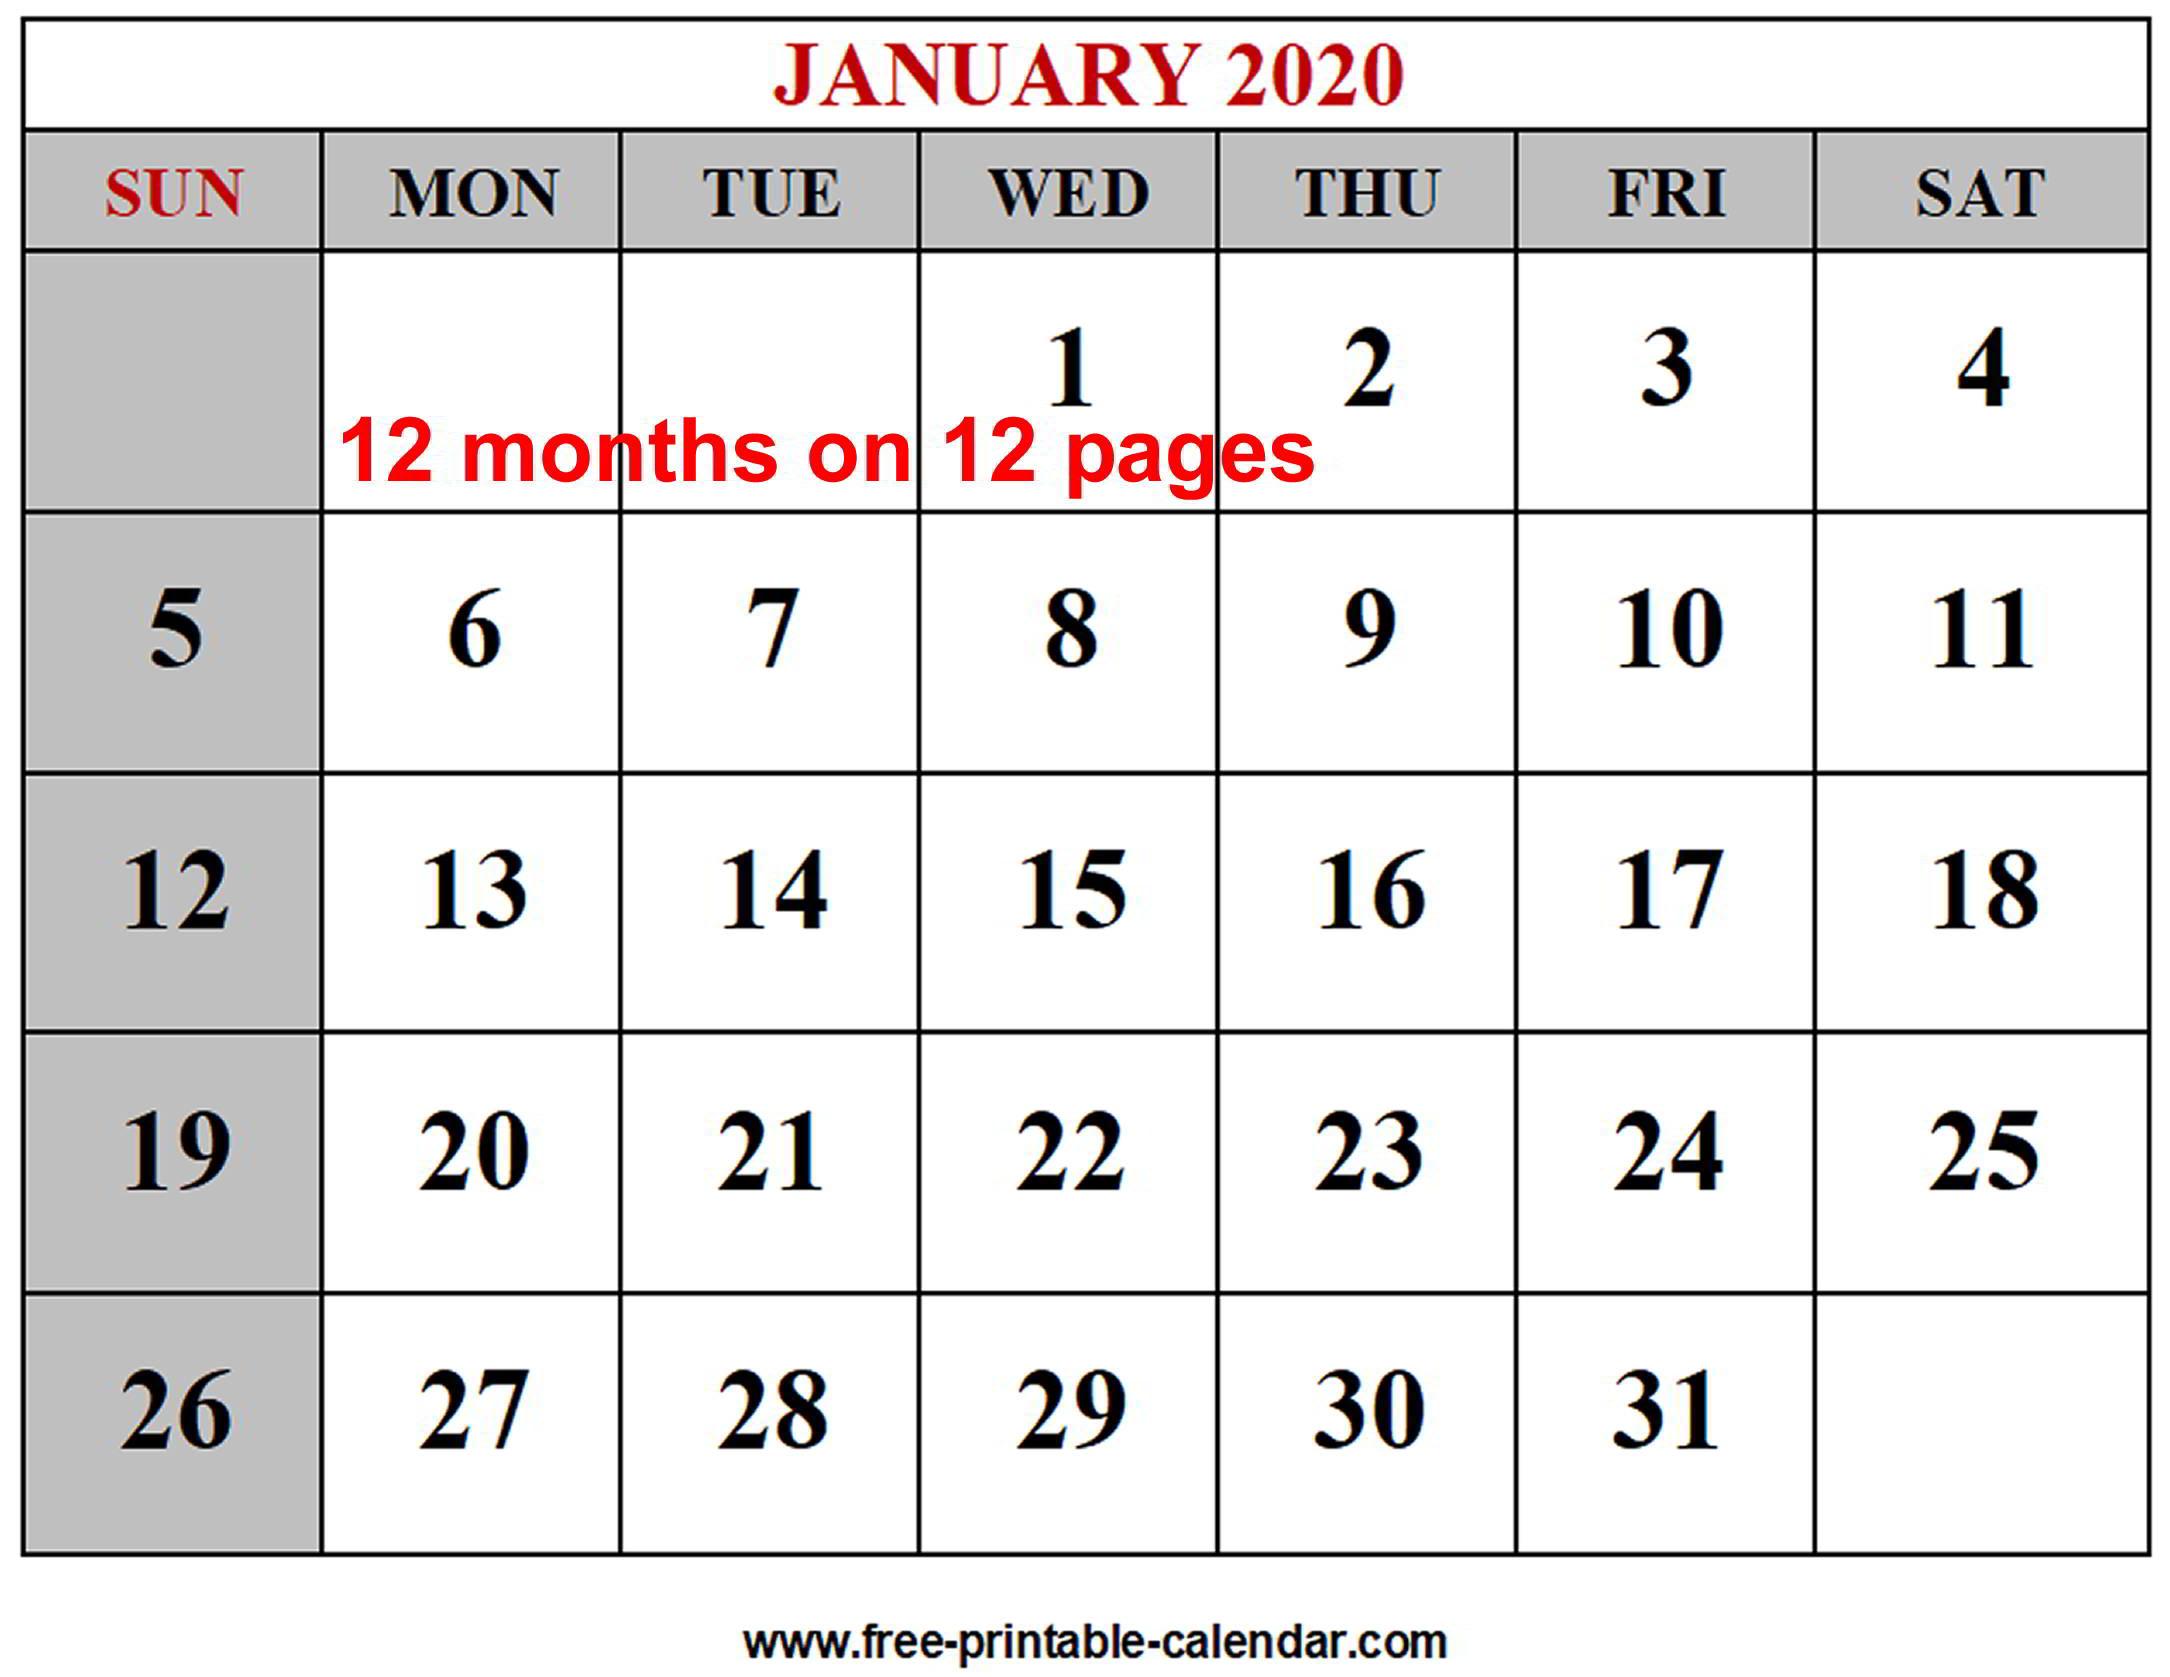 Year 2020 Calendar Templates - Free-Printable-Calendar within 2020 Year At A Glance Free Printable Calendar